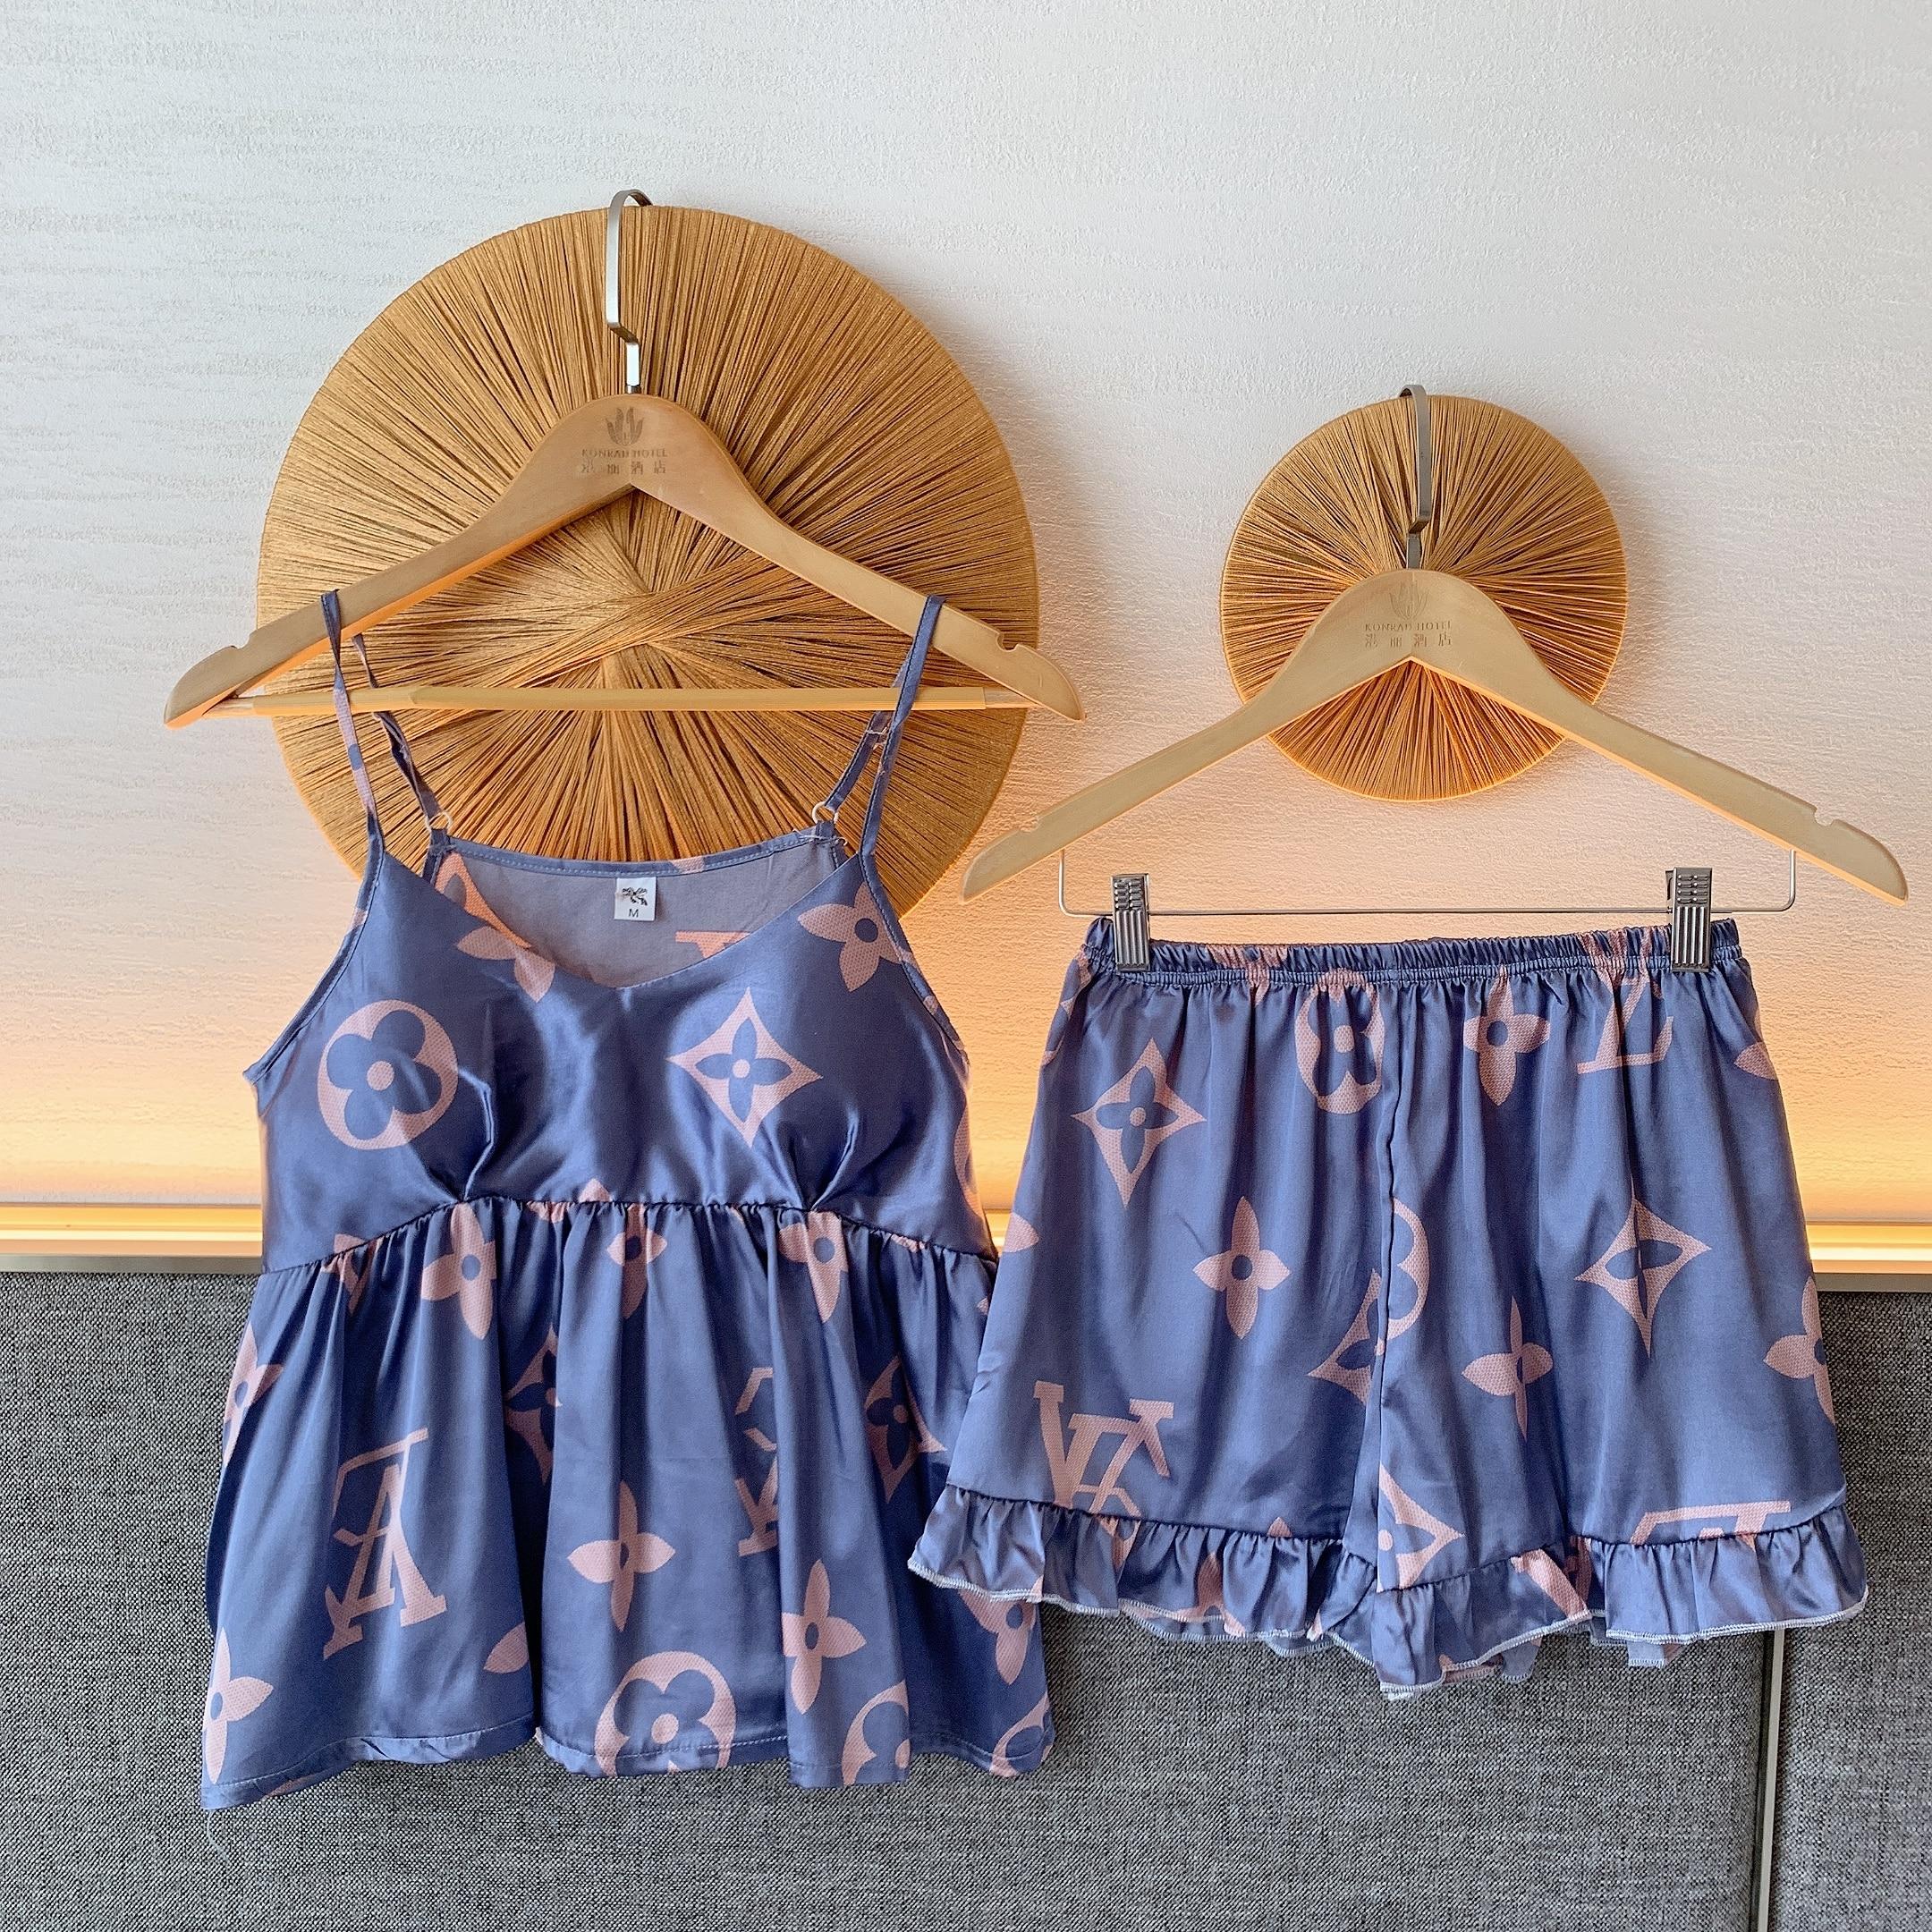 HaloSweet Sling Sleepwear Women Sexy Summer Slik Pajamas Home Clothes Female High Quality Lady Pijamas Shorts Two Piece Pyjamas|Pajama Sets| - AliExpress